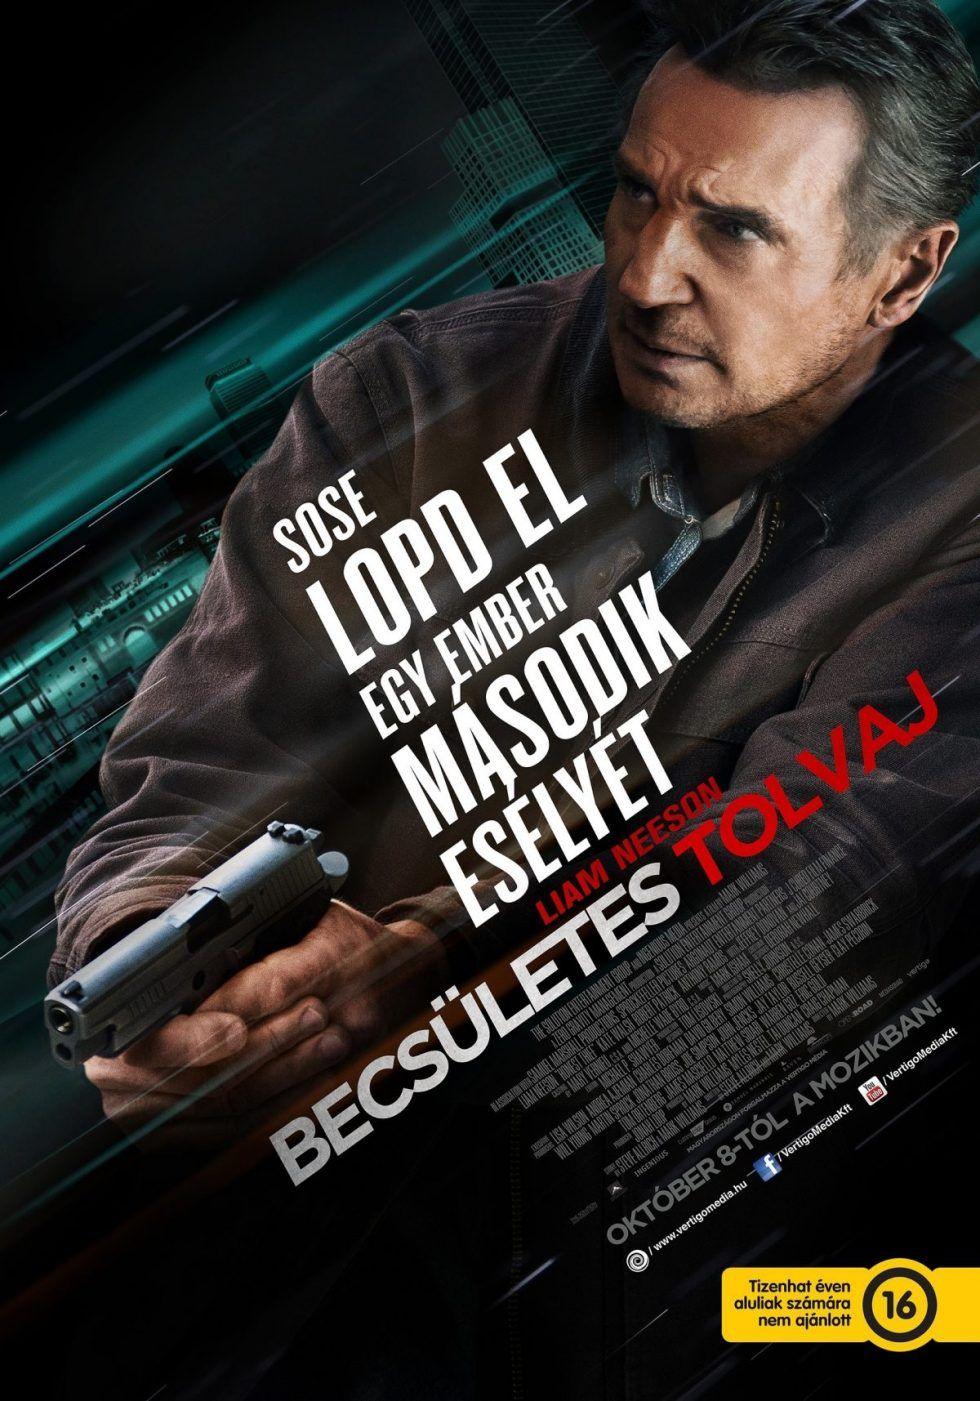 Becsuletes Tolvaj Honest Thief 2020 Mozi Film Online Magazin Mozinezo Liam Neeson Thief Free Movies Online